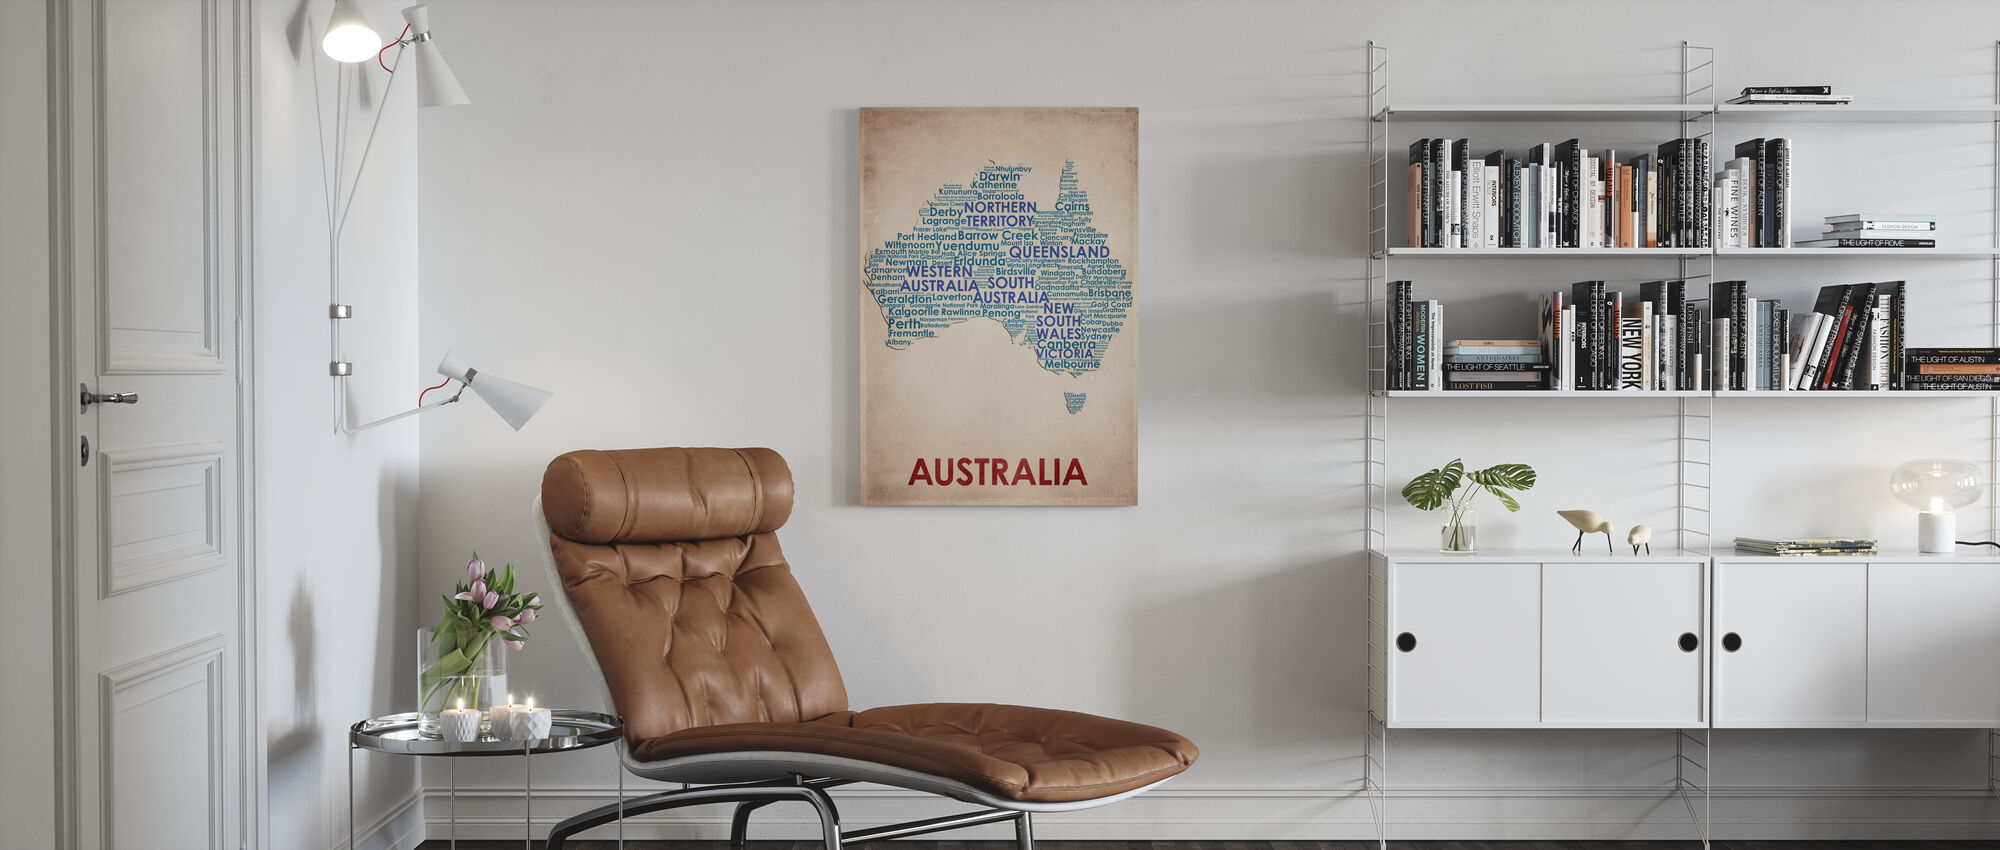 Australien Karta - Canvastavla - Vardagsrum